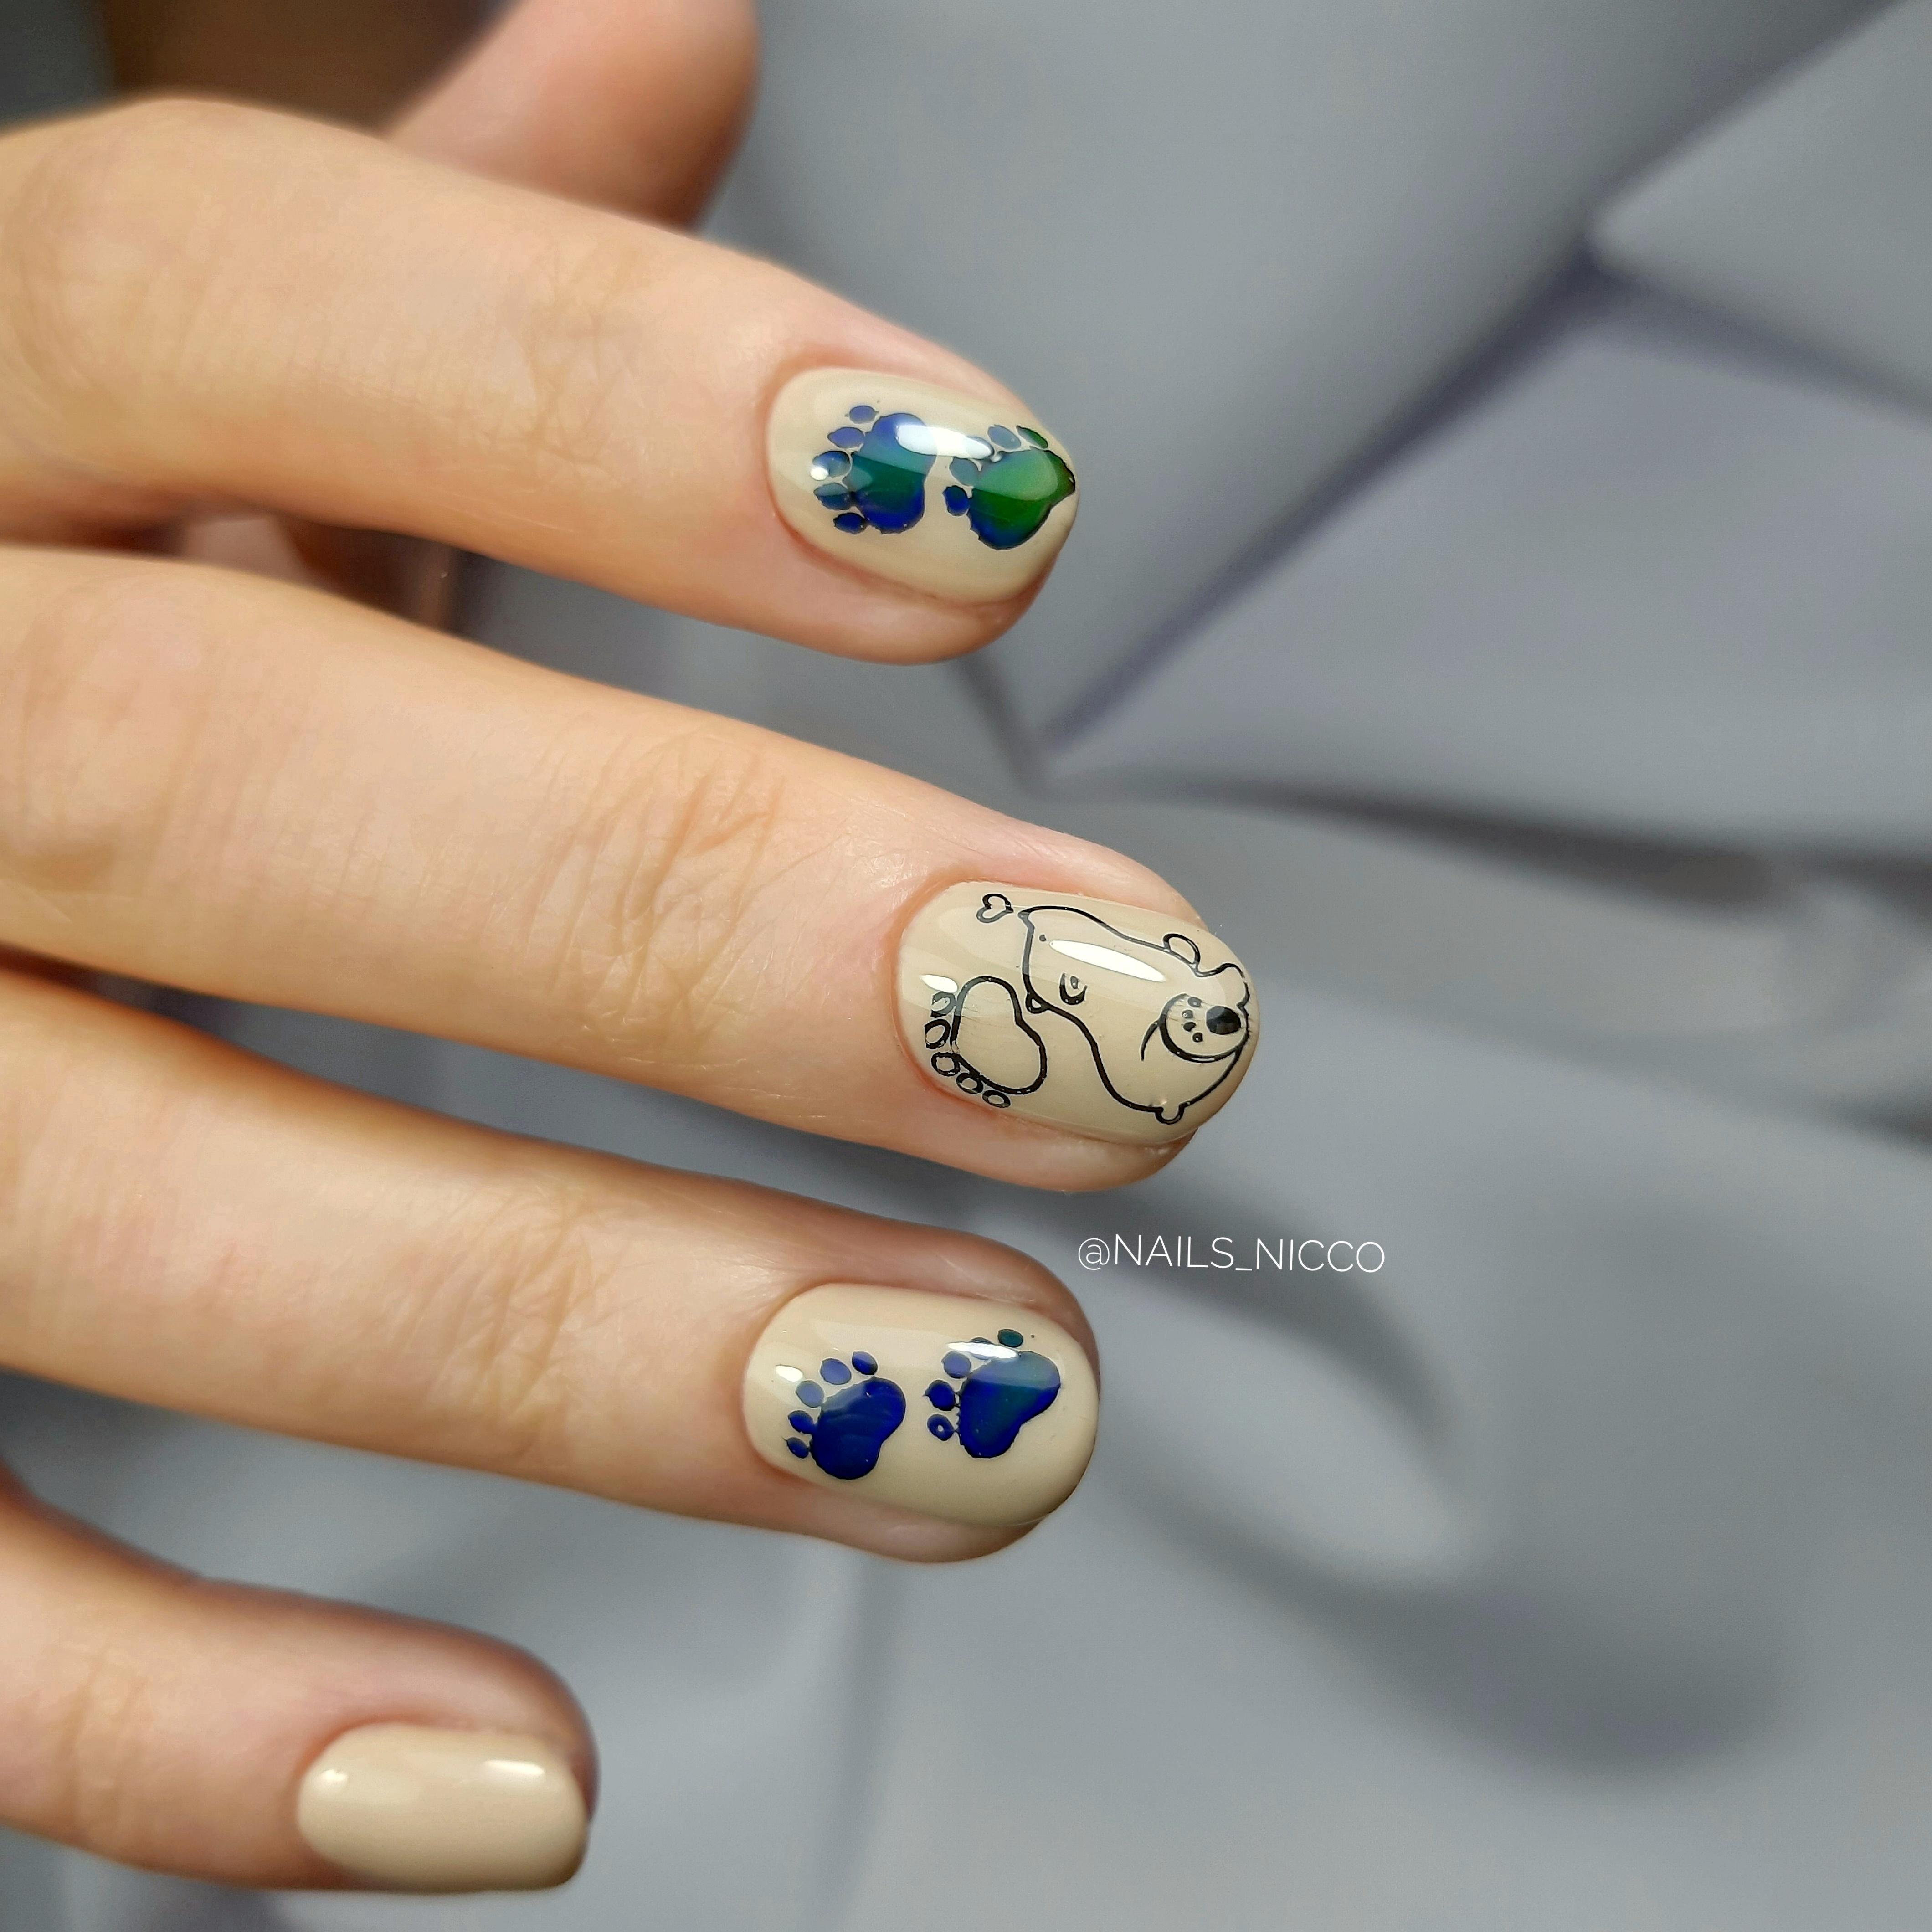 Маникюр со слайдерами в бежевом цвете на короткие ногти.